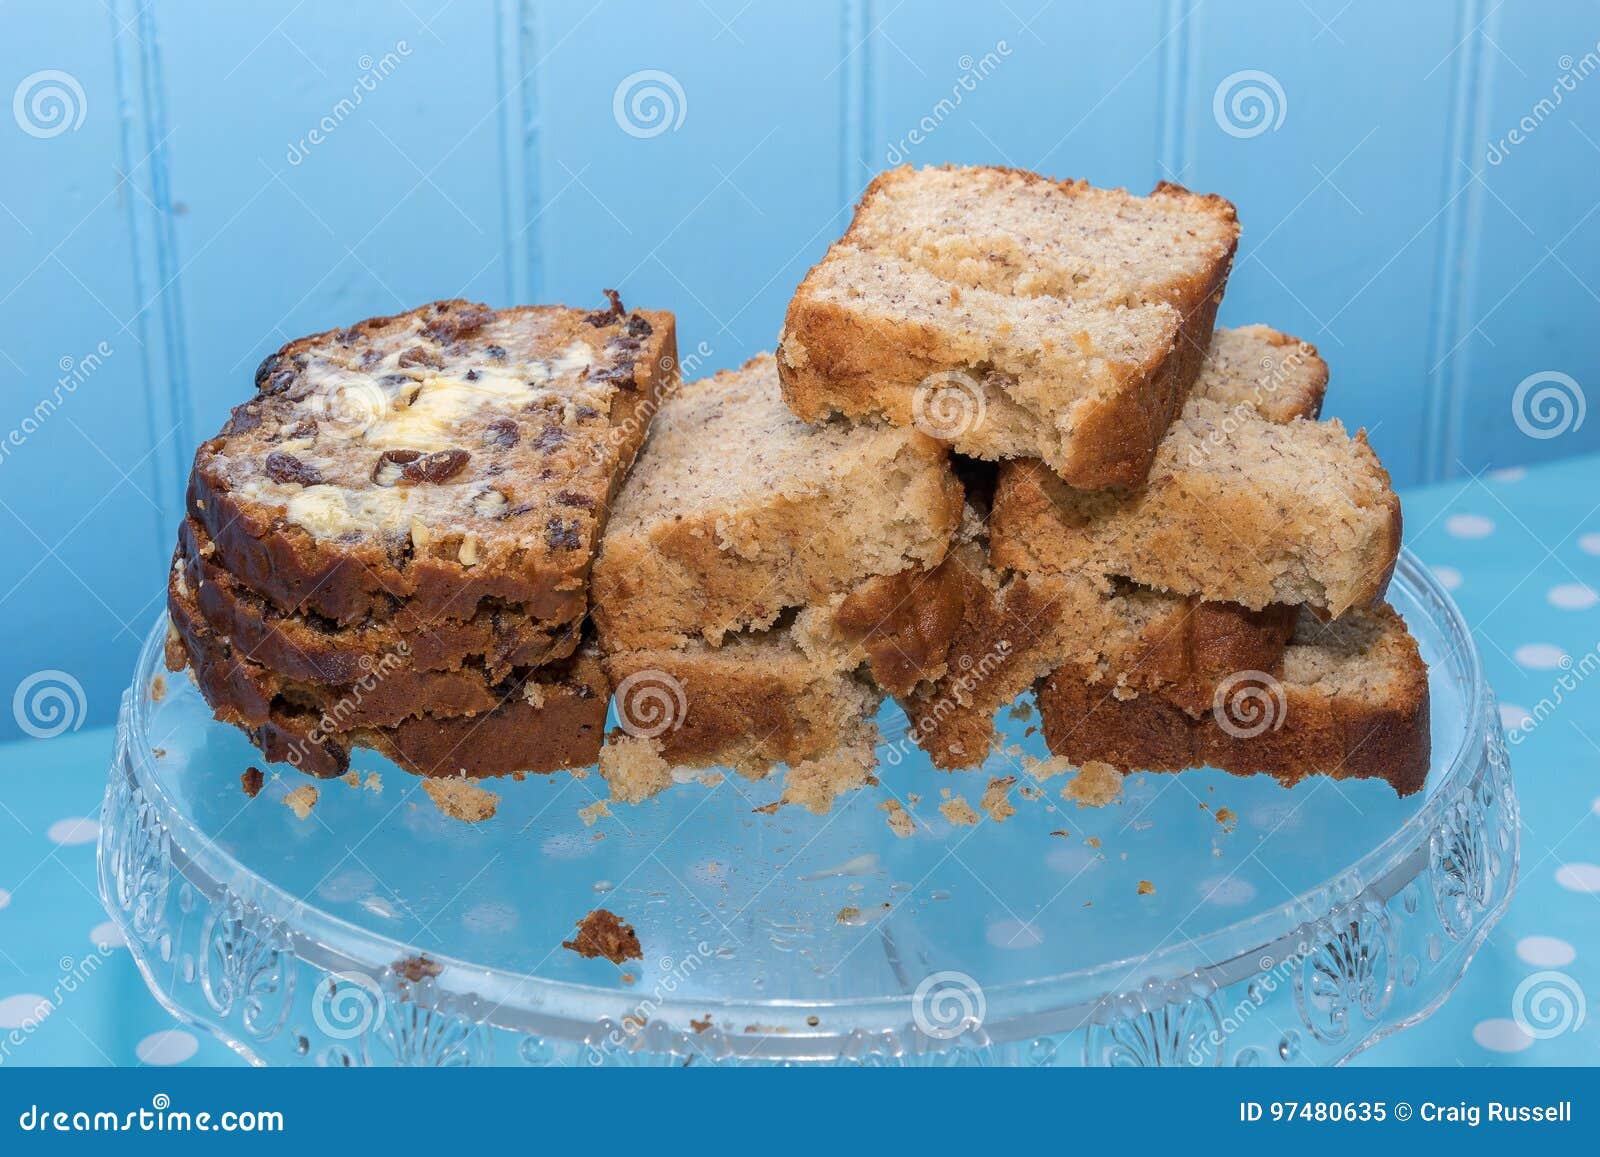 Welsh Bara Brith And Banana Cake Stock Image Image Of Loaf Sultana 97480635